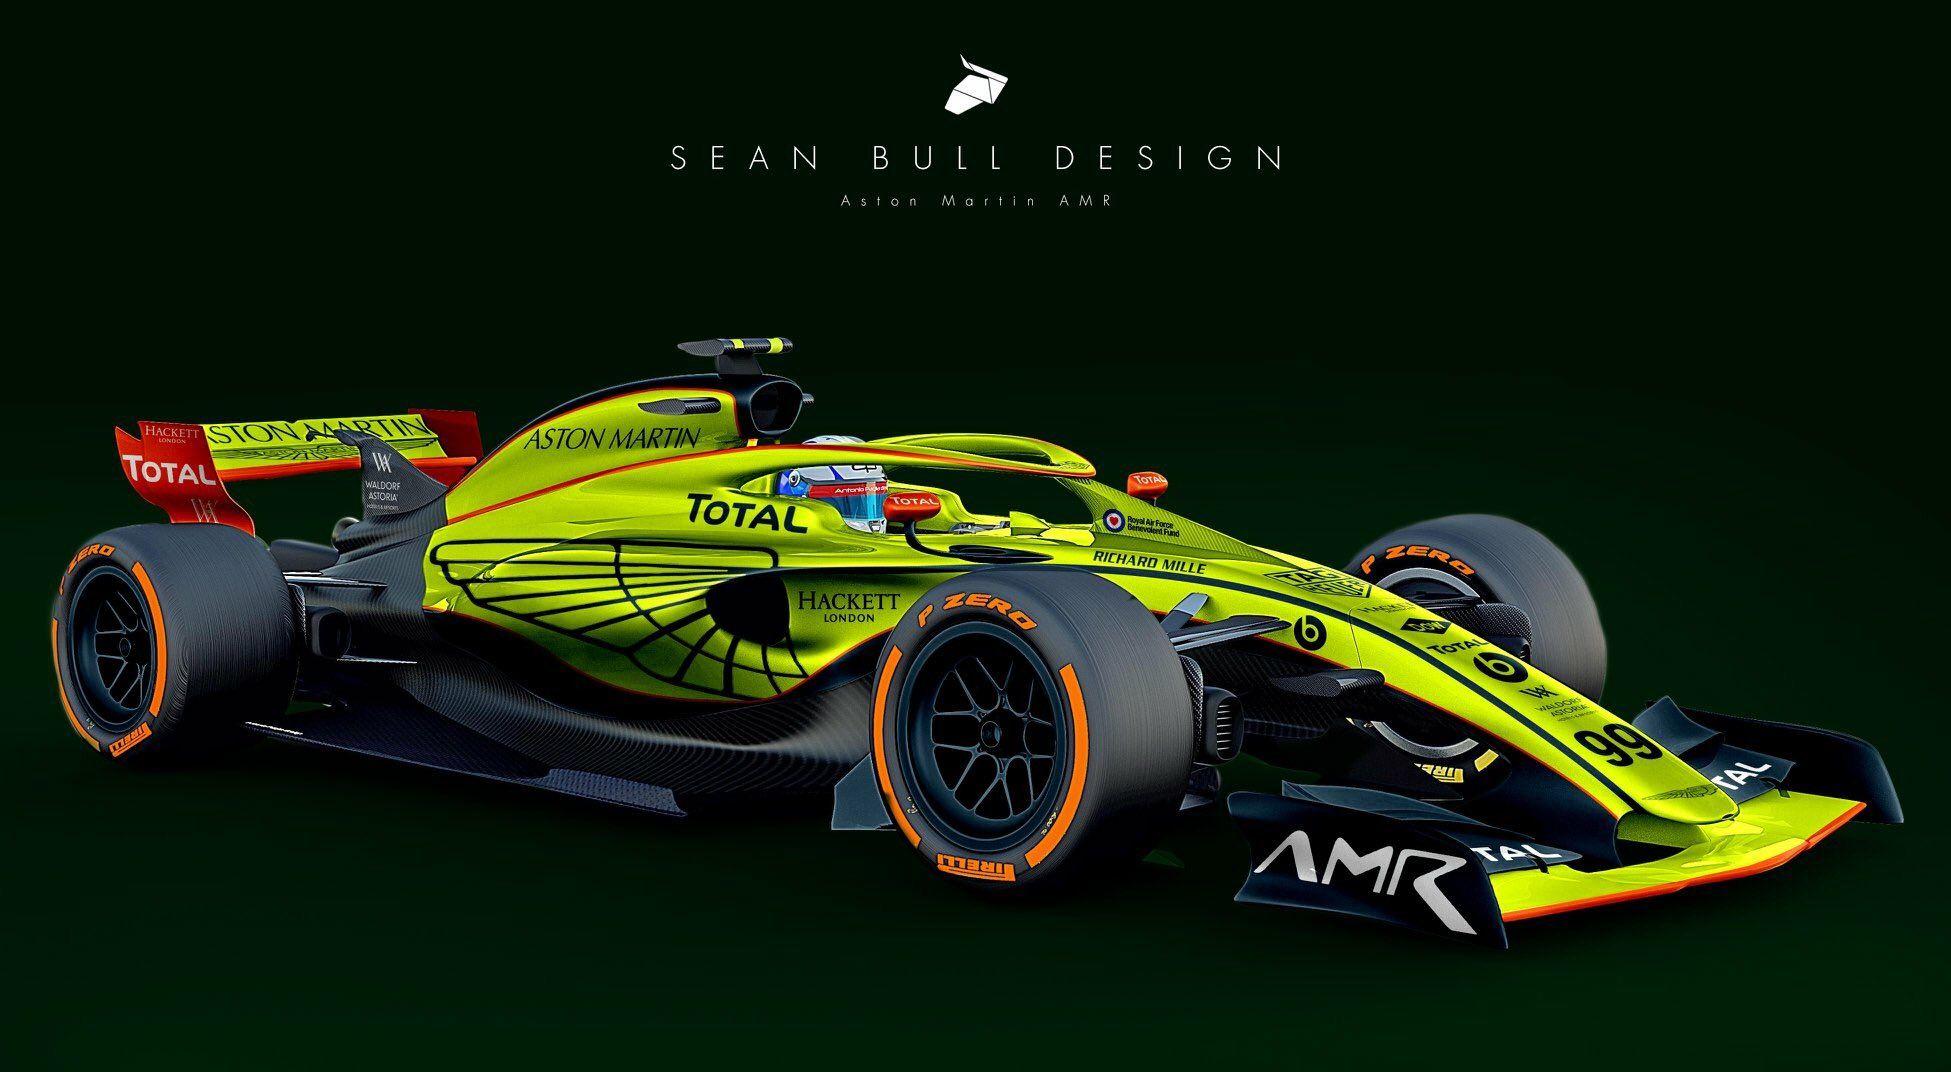 Sean Bull Design On Twitter Aston Martin Cars Aston Martin Car